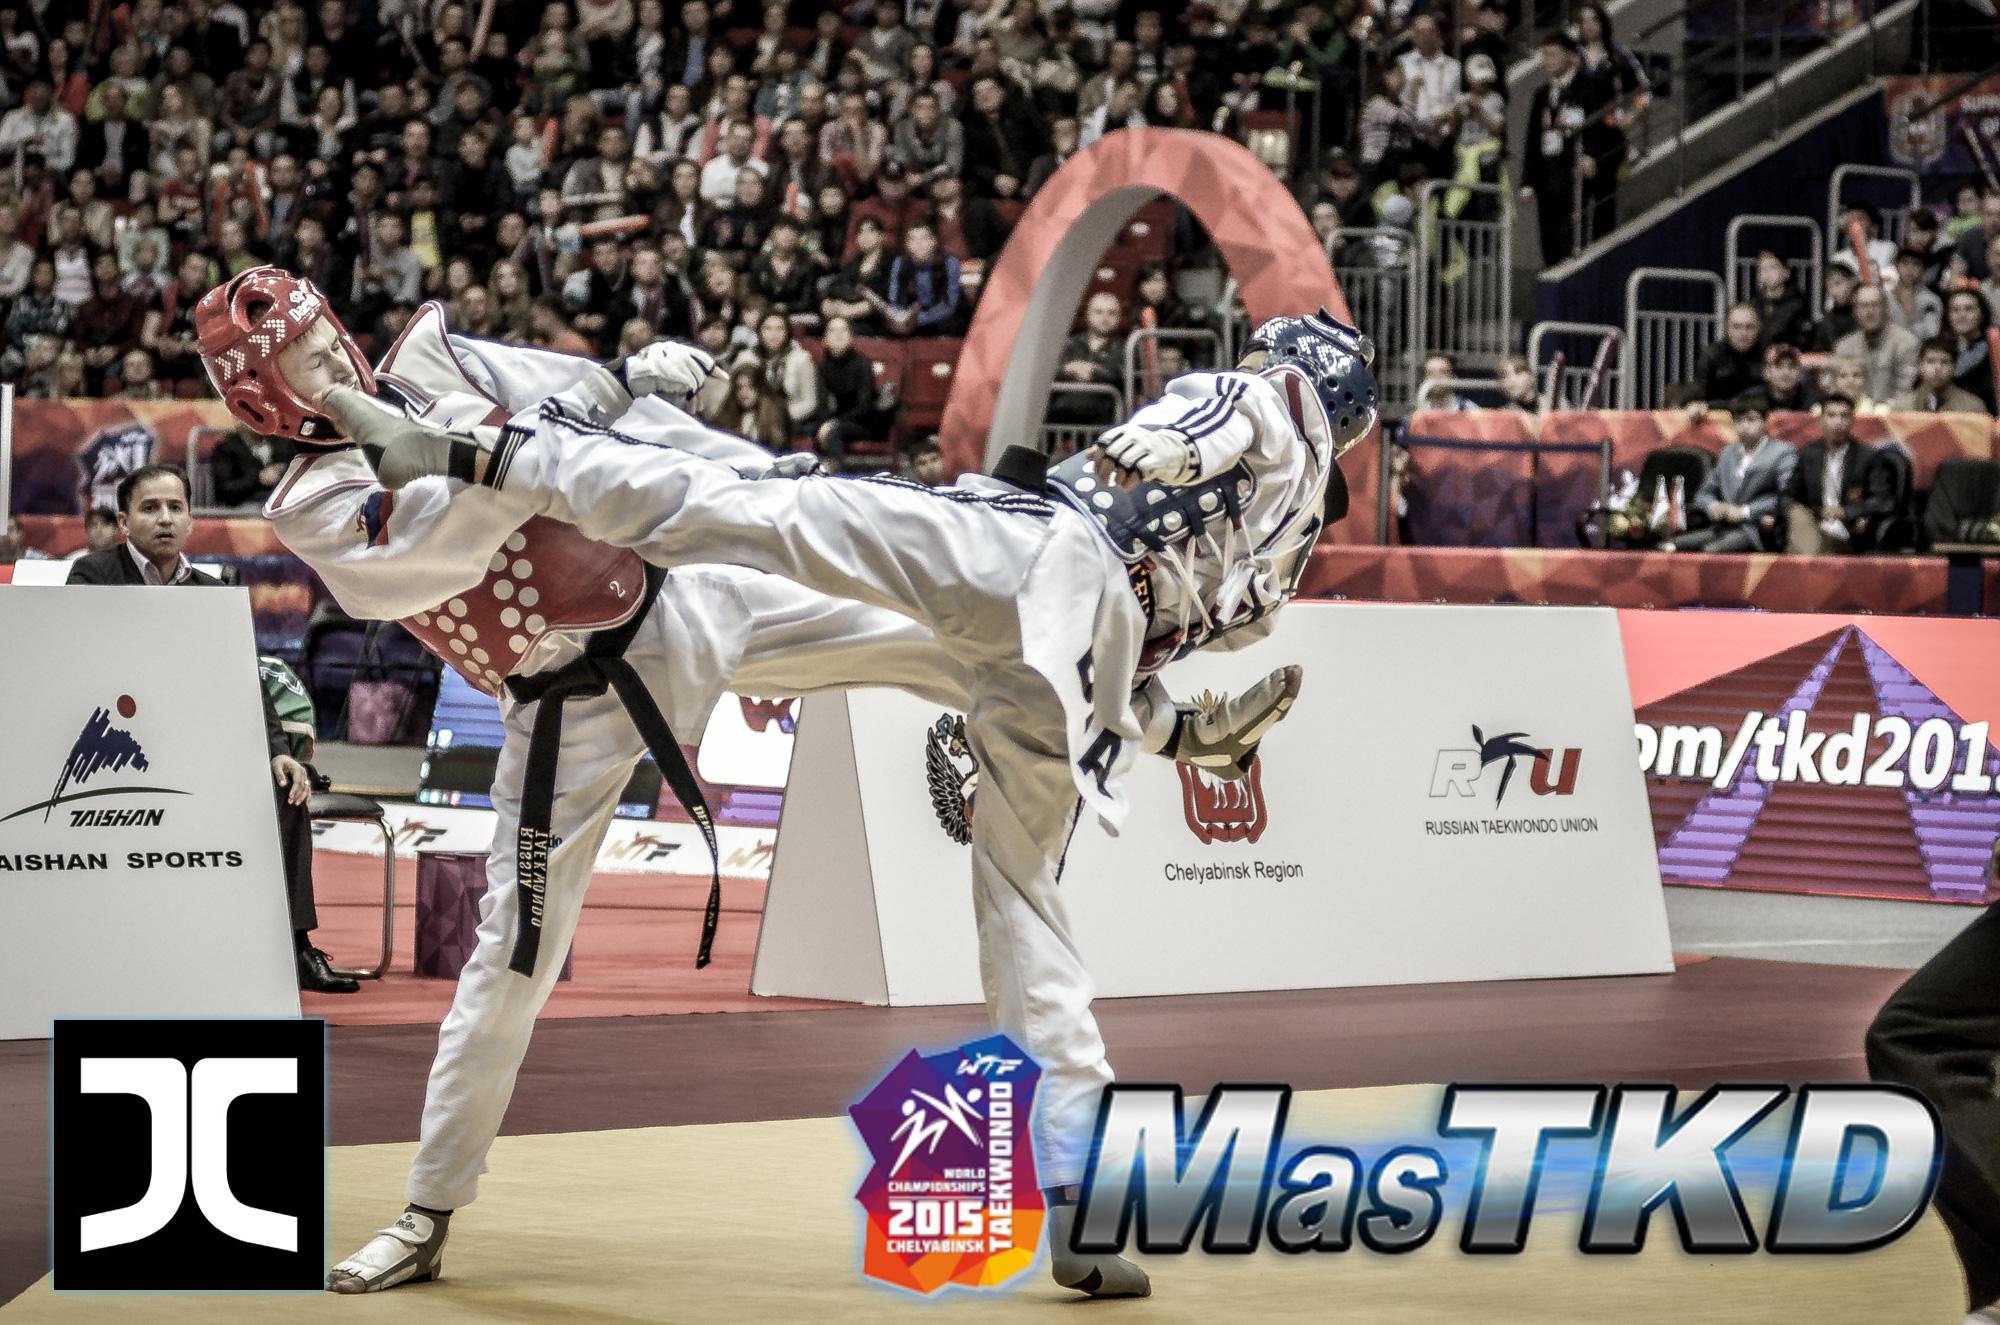 12_JCalicu-Mejores-imagenes-del-Mundial-de-Taekwondo_d5